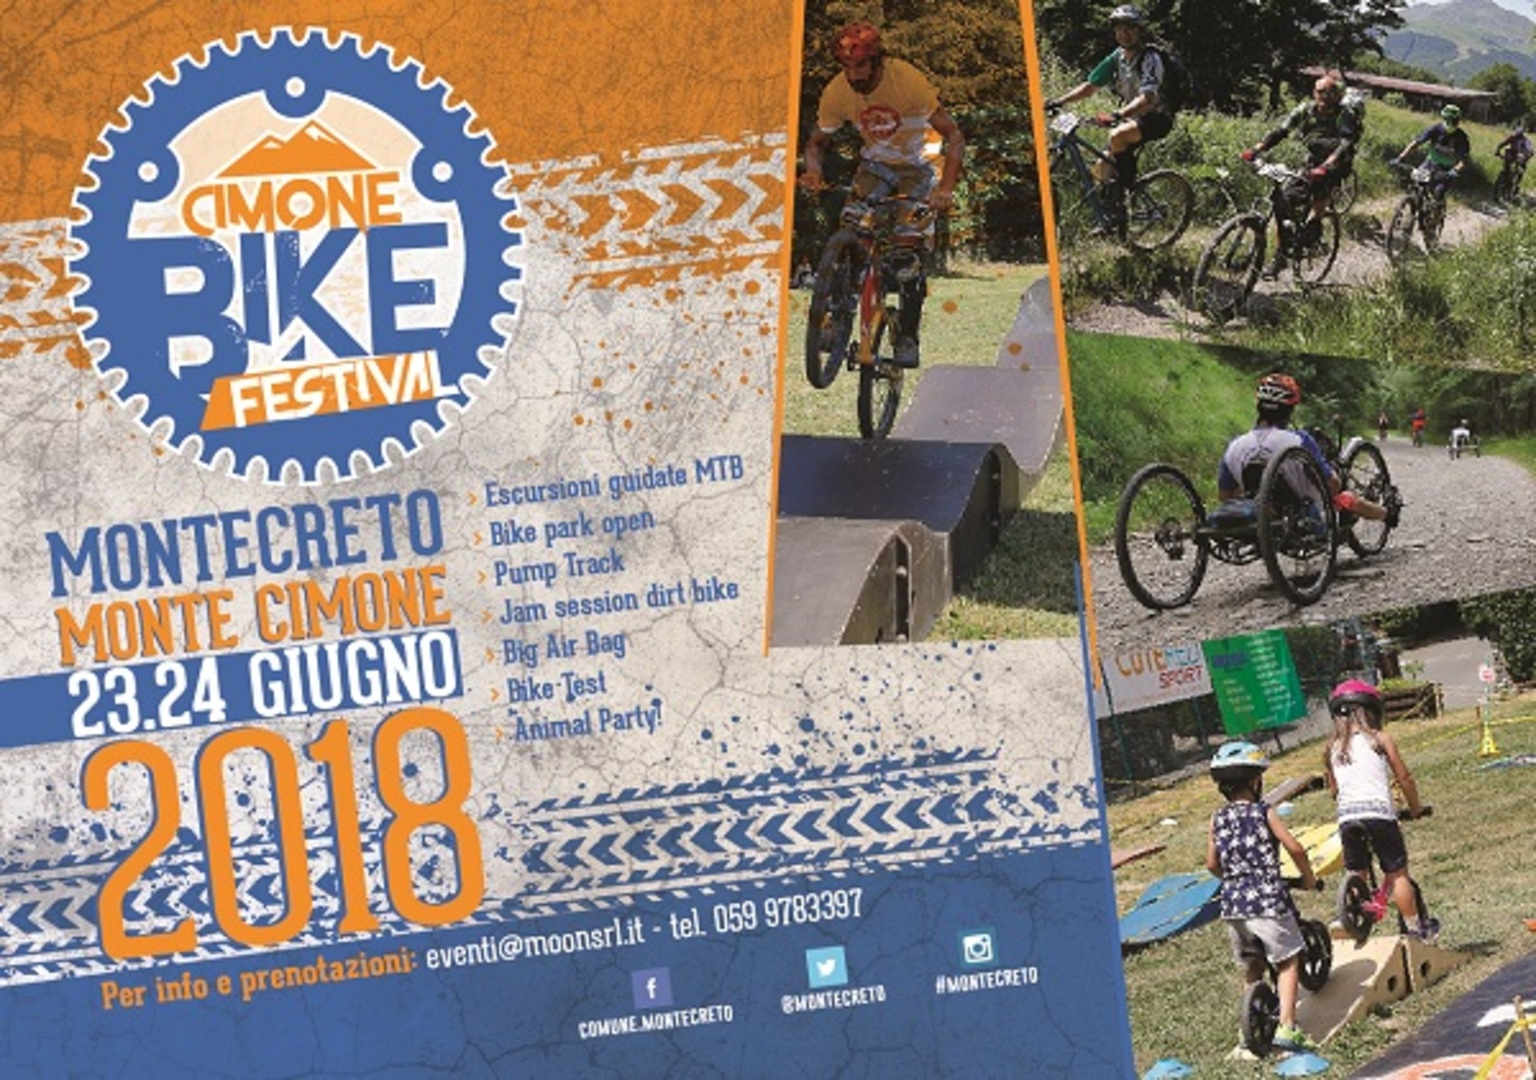 Cimone BIke Festival 2018